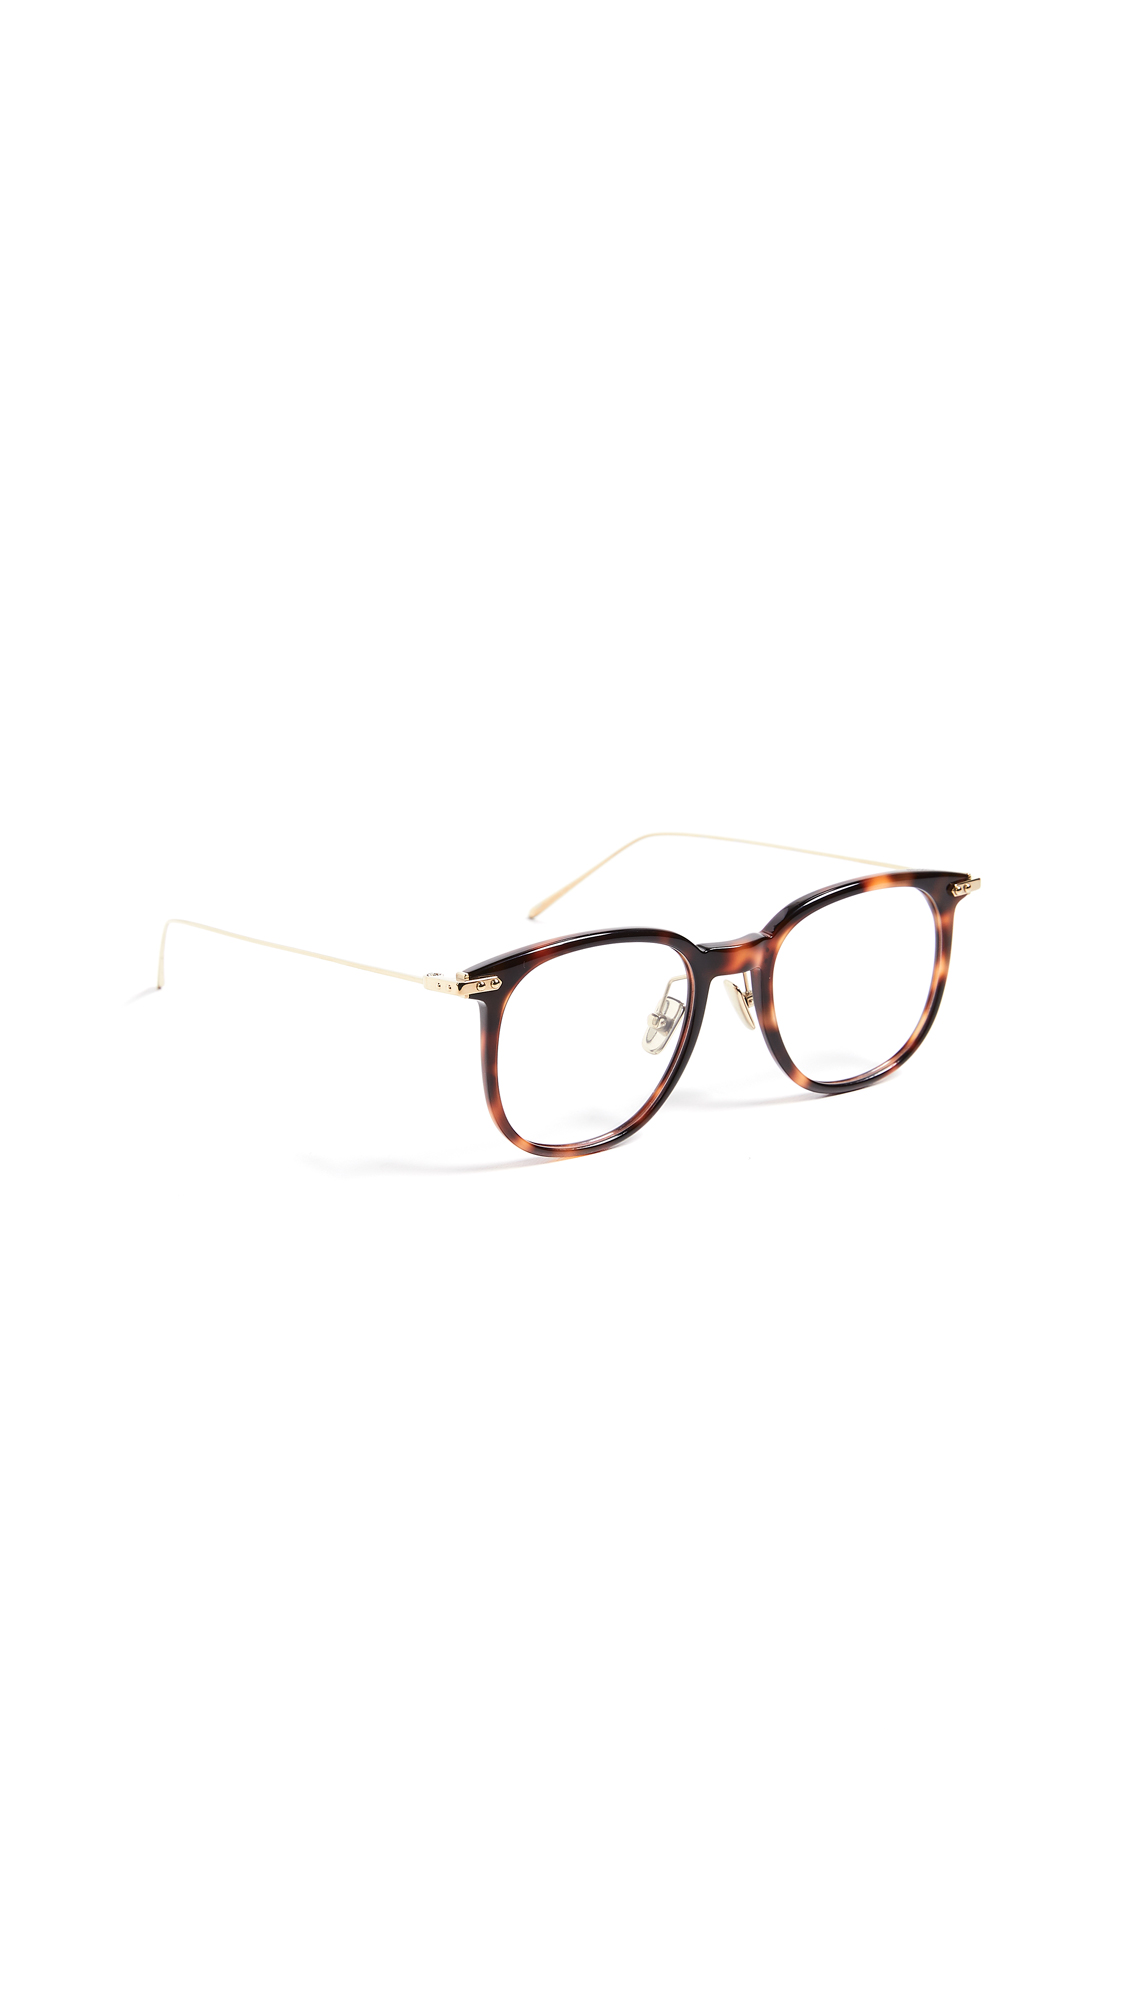 LINDA FARROW LUXE Linear Optical Oversized Wayfarer Glasses in Shell/Light Gold/Optical